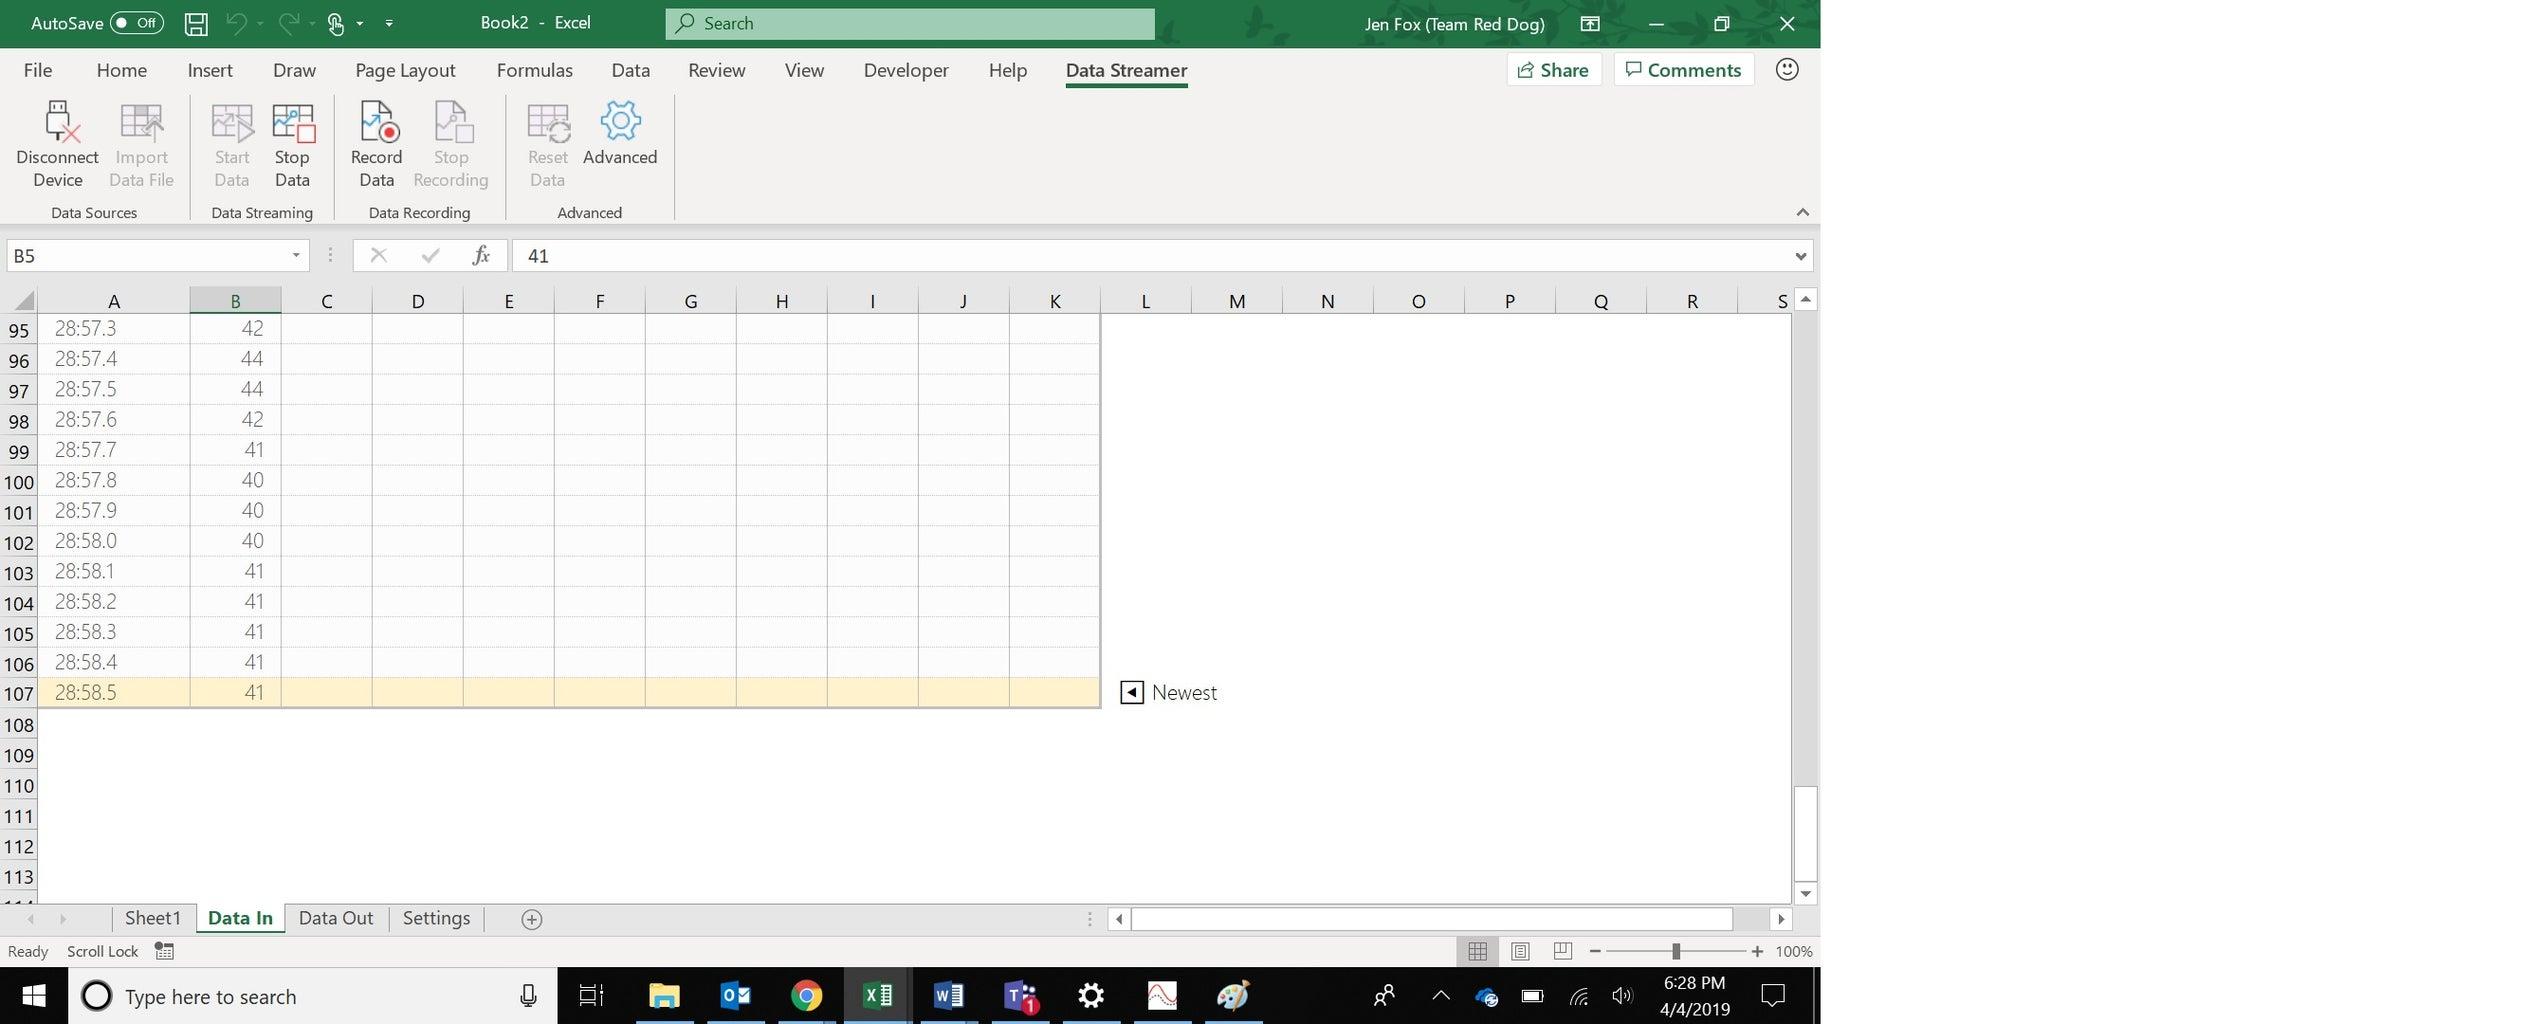 Visualizing Data: Excel! Part 1